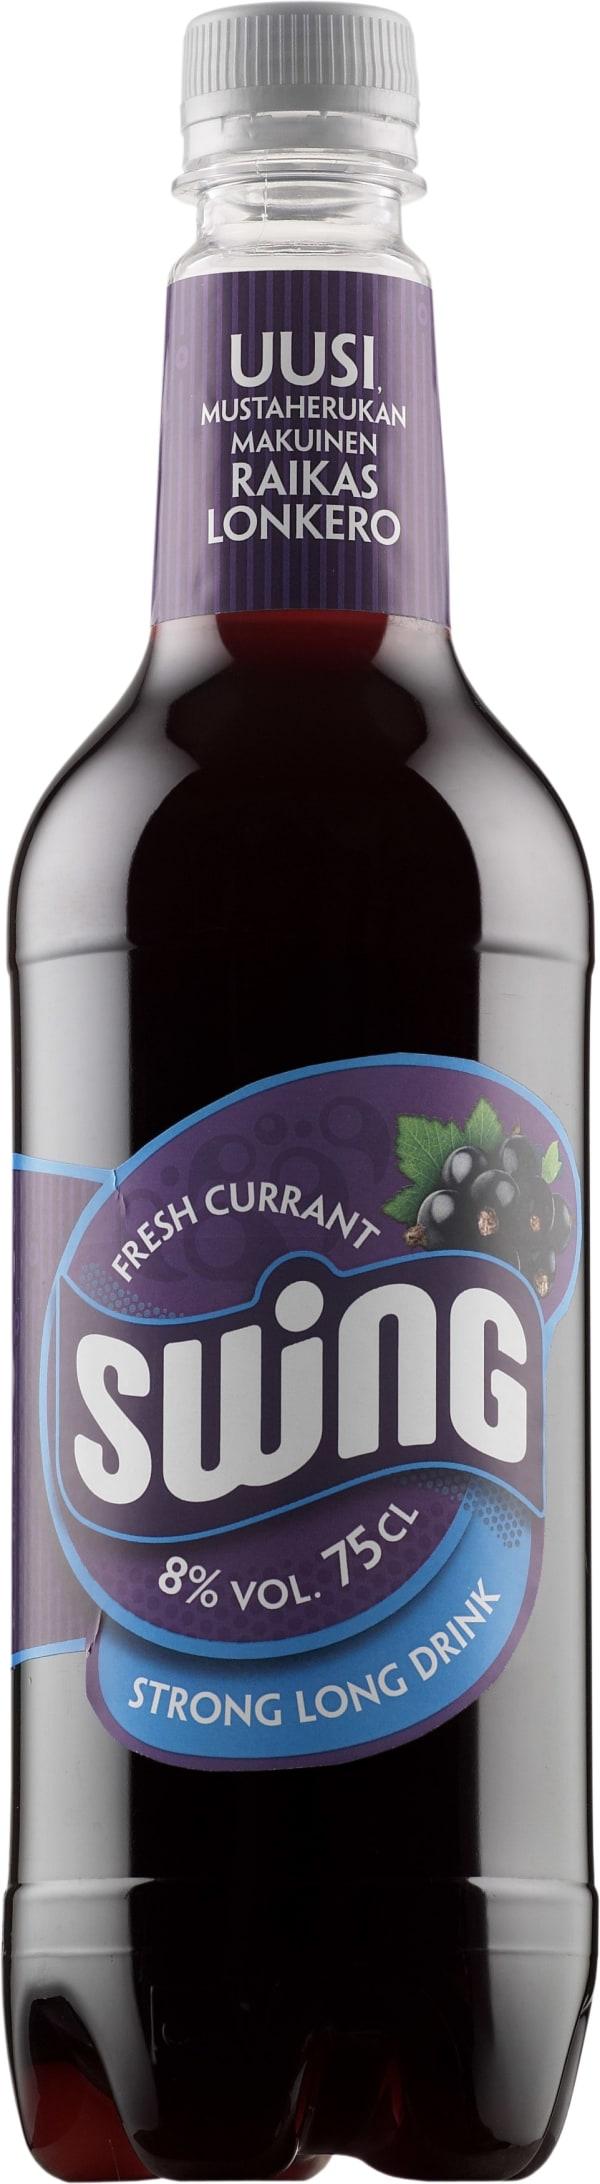 Swing Fresh Currant Strong Long Drink plastflaska